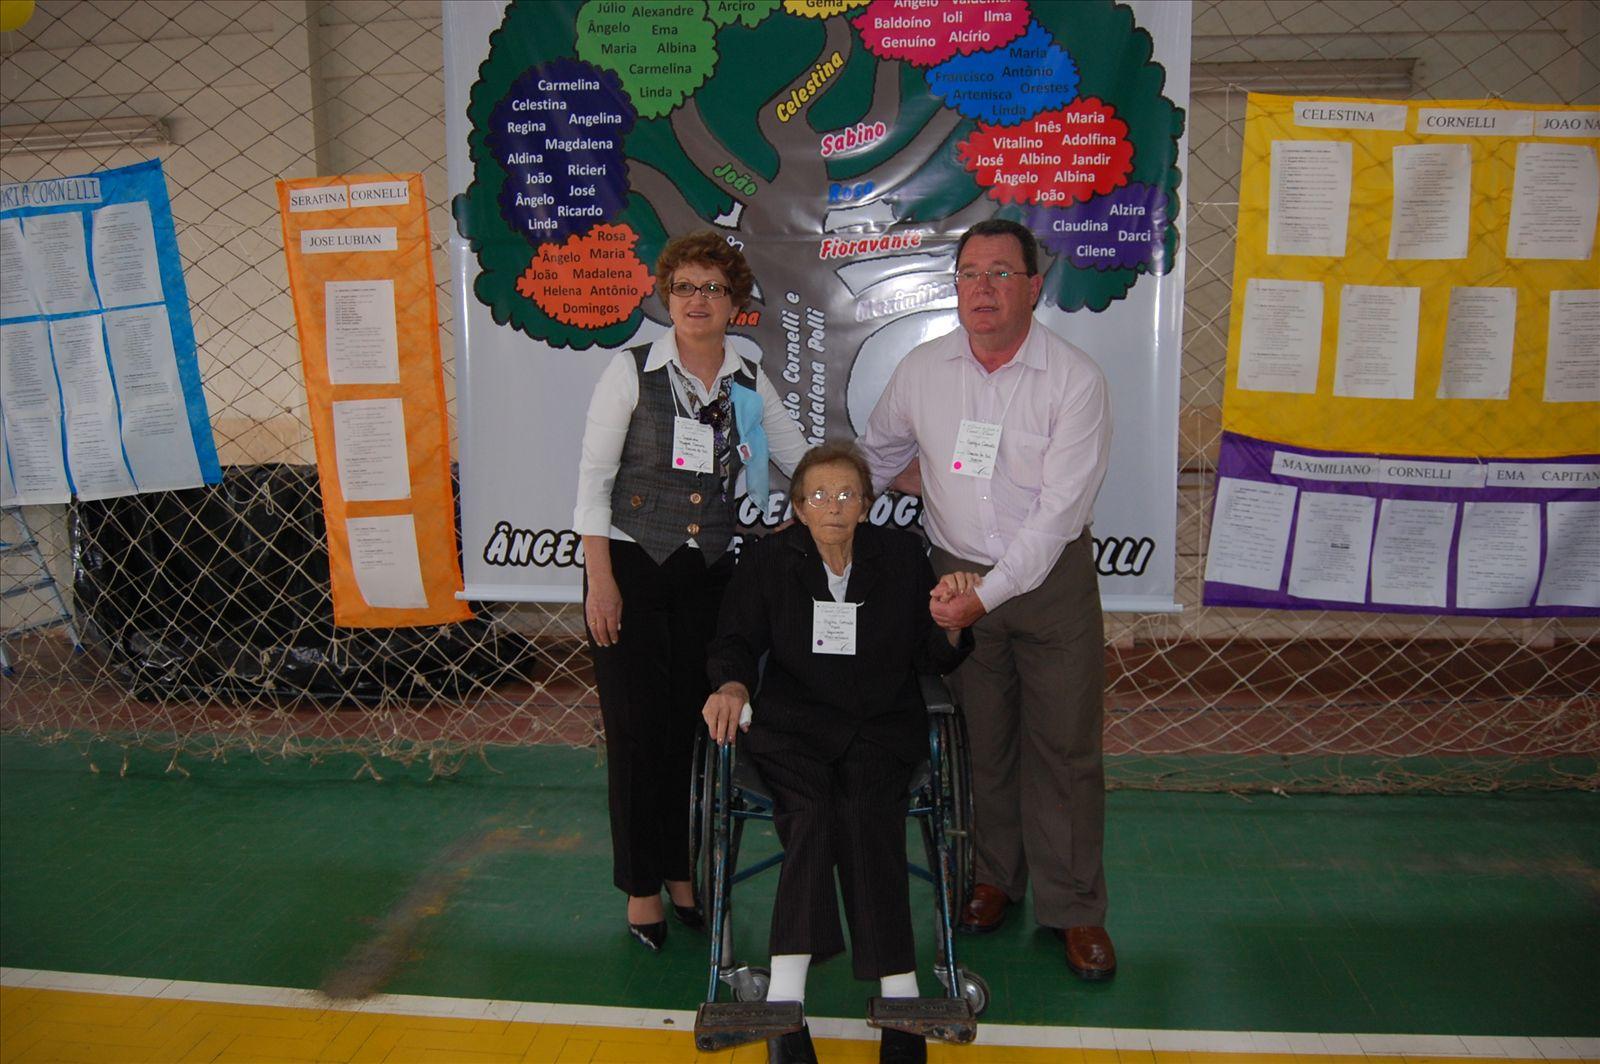 2º Encontro Família Cornelli - 11.10.2009 (218)_0